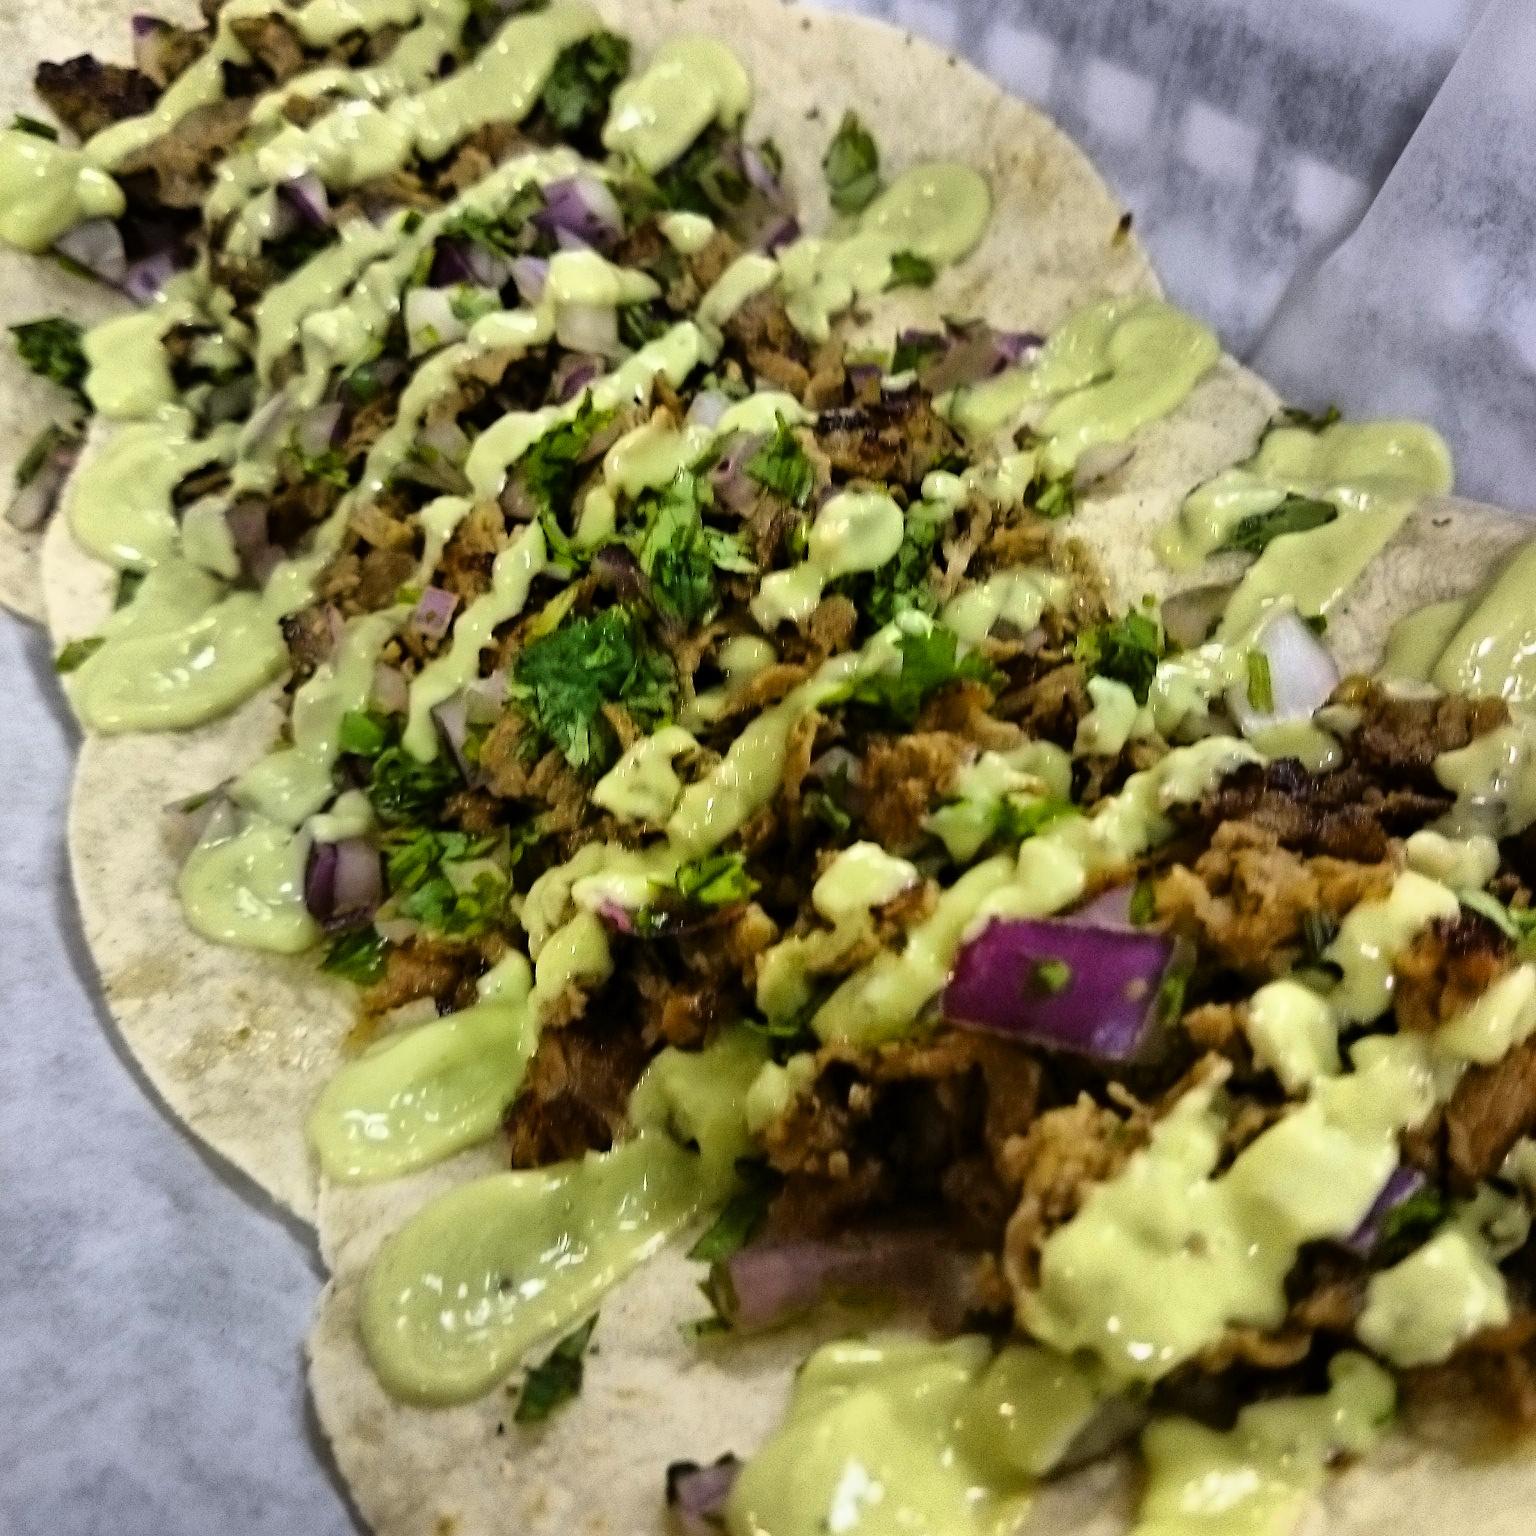 Rulis 39 international kitchen el paso texas tx for Italian kitchen el paso tx menu